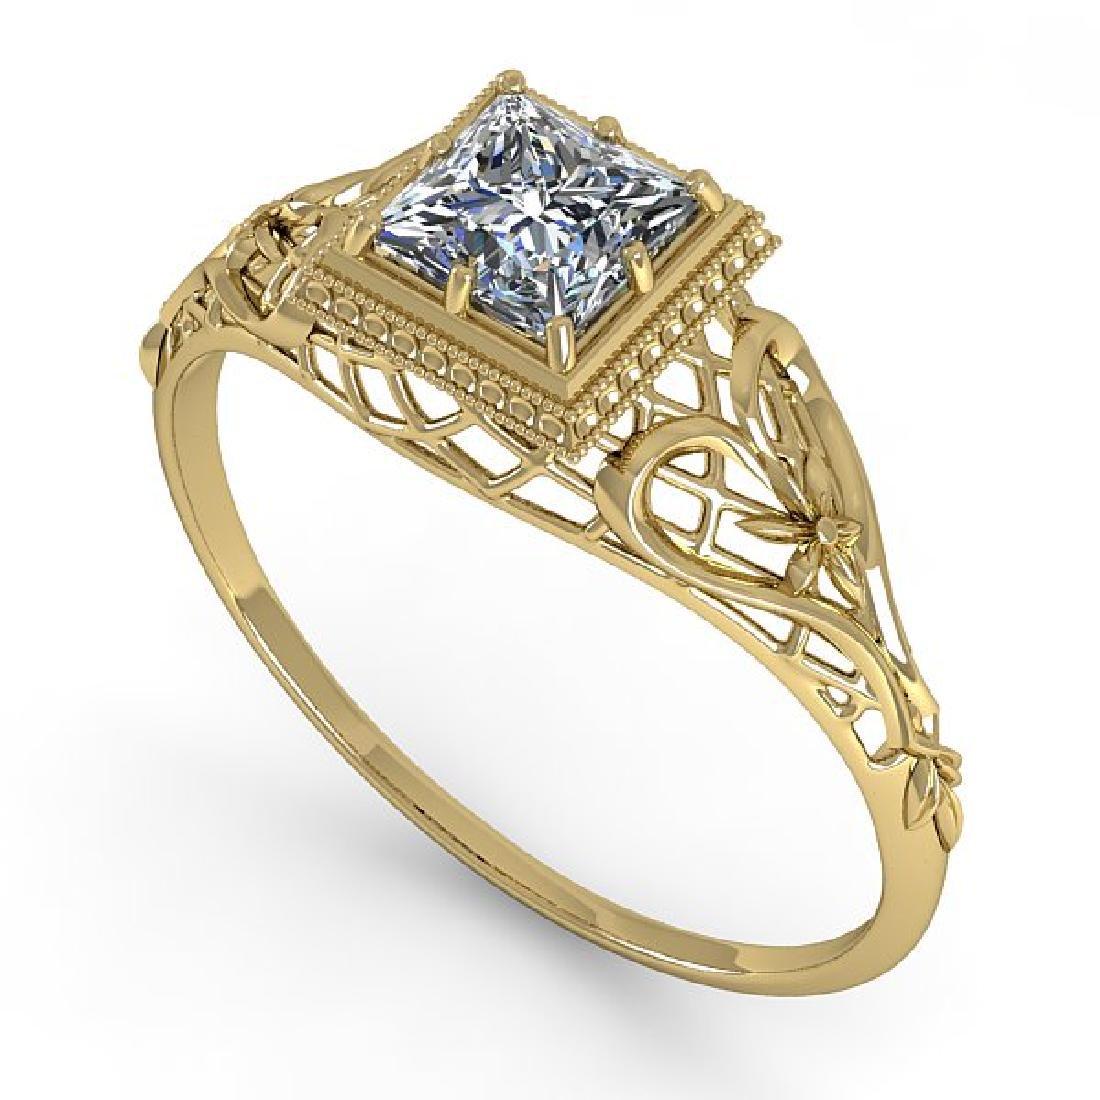 0.50 CTW VS/SI Princess Diamond Solitaire Ring Art Deco - 2